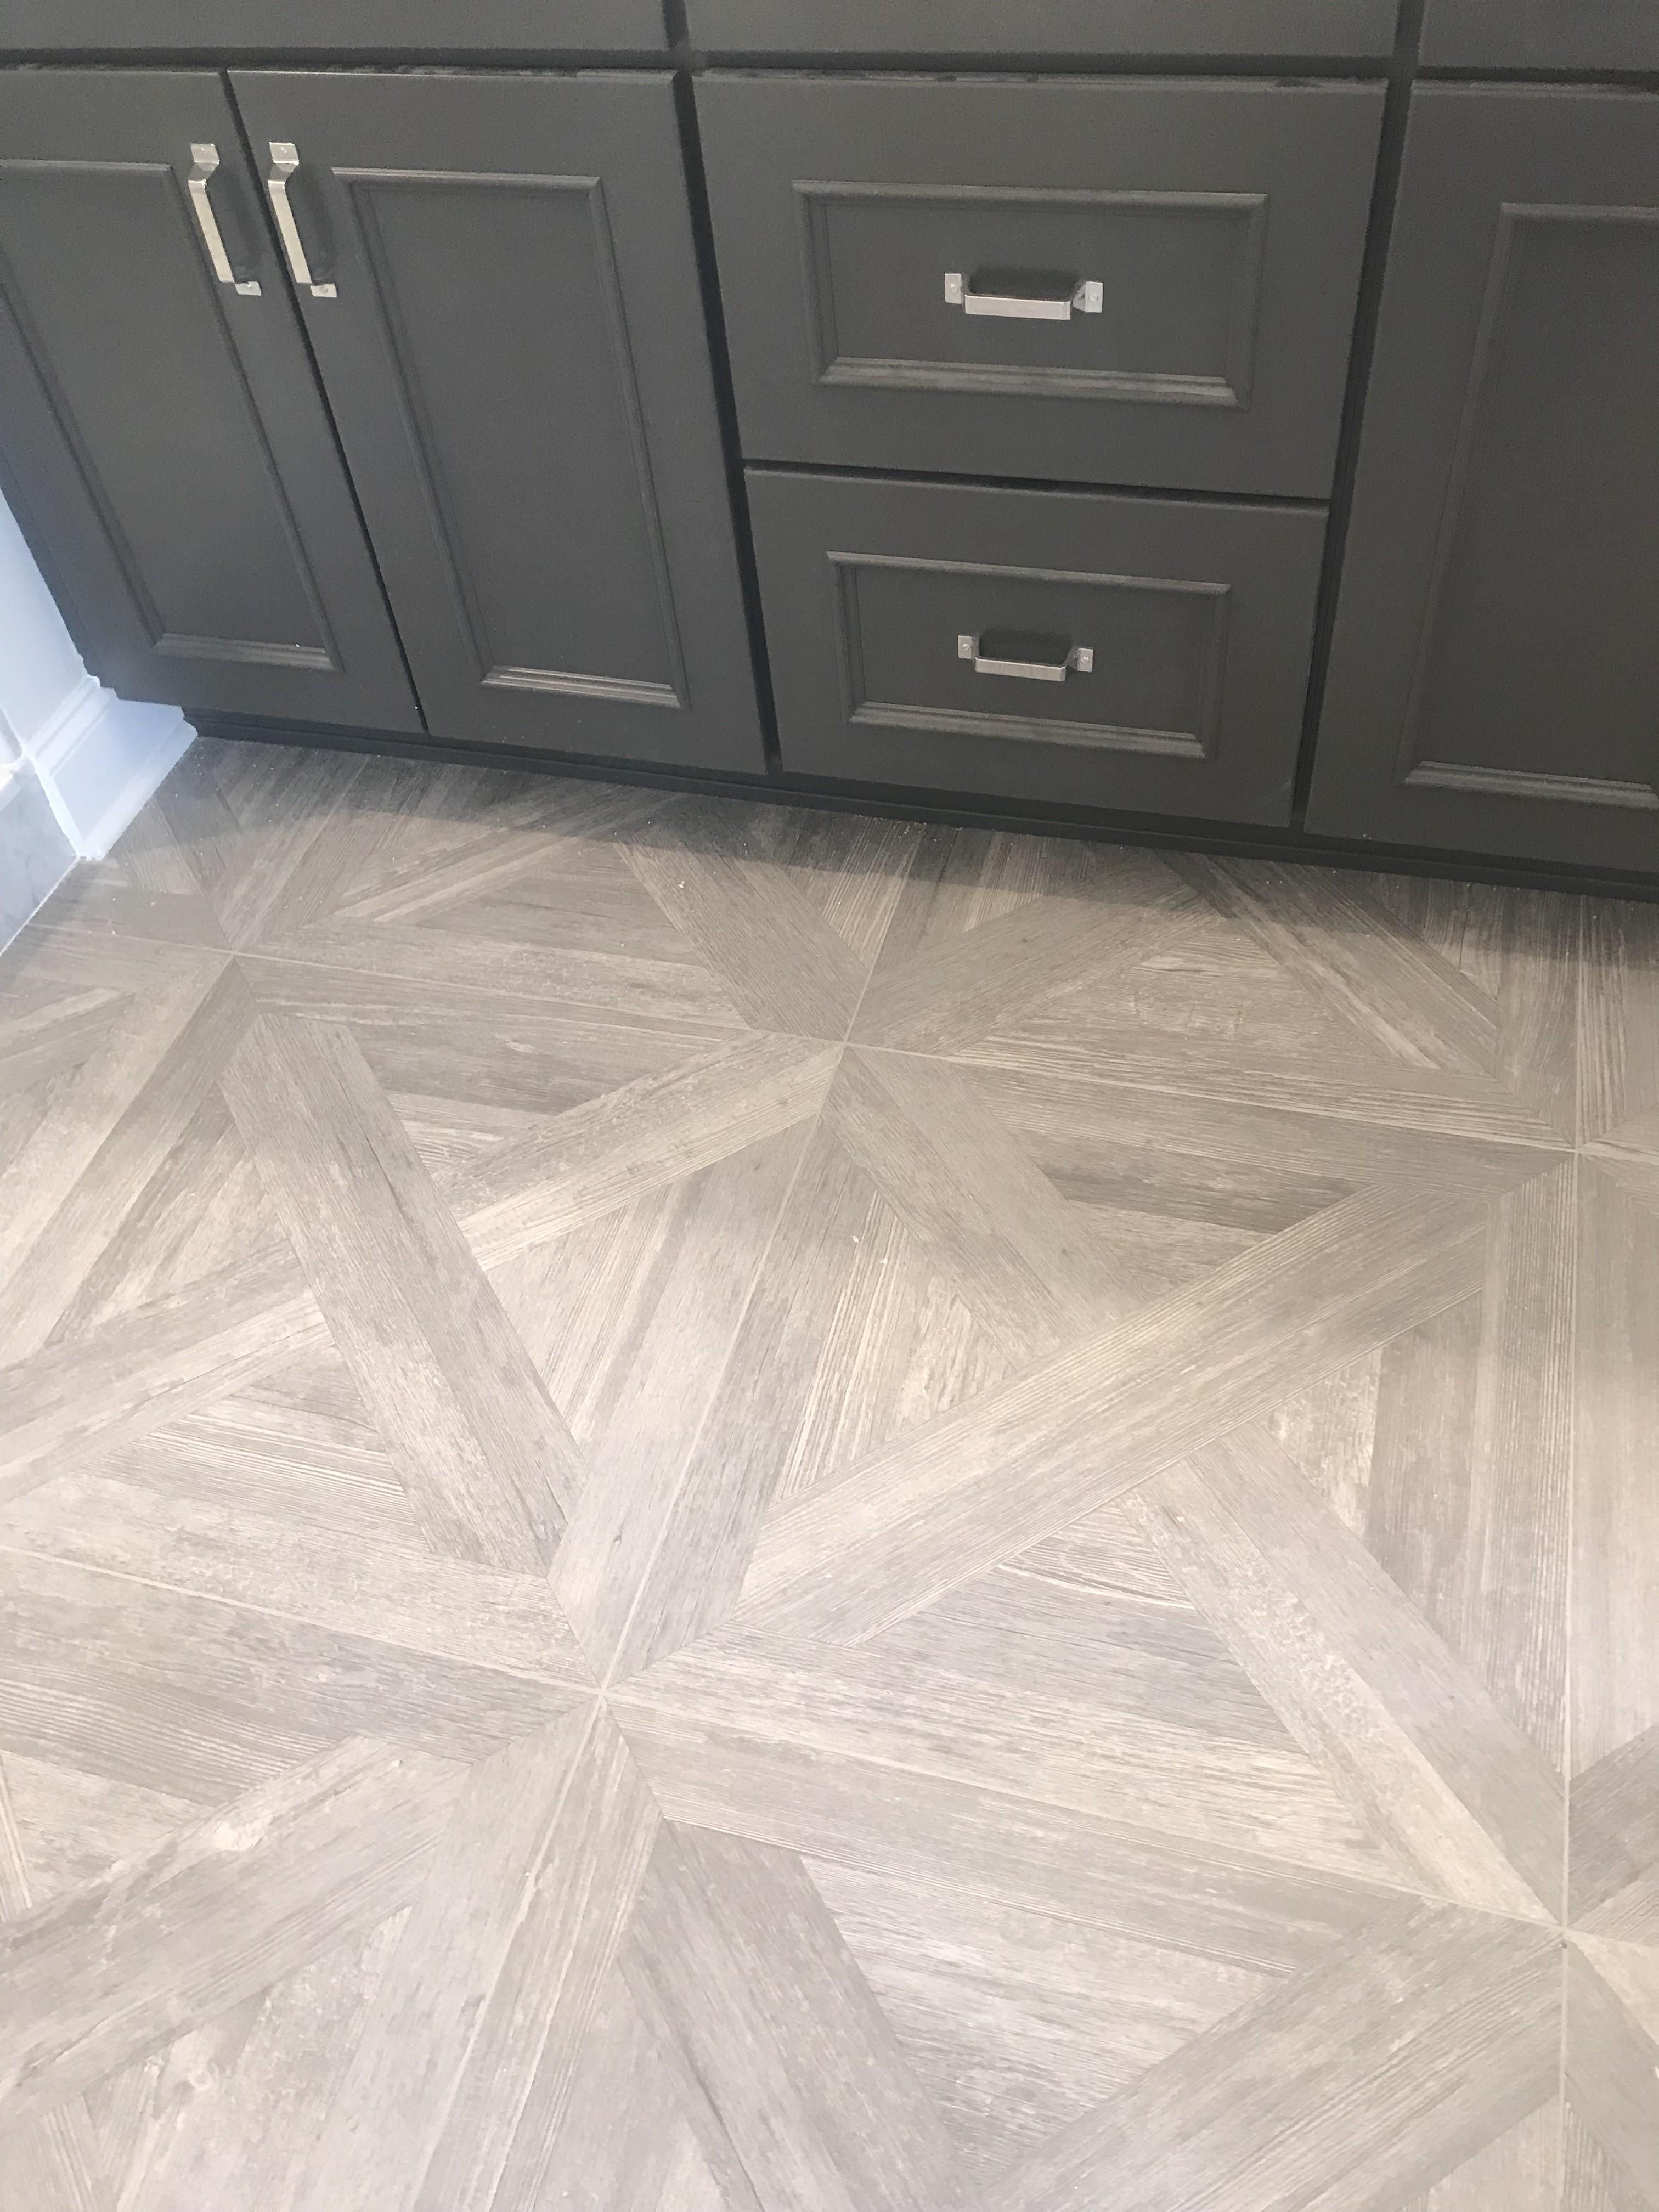 24×24 Porcelian wood tile look